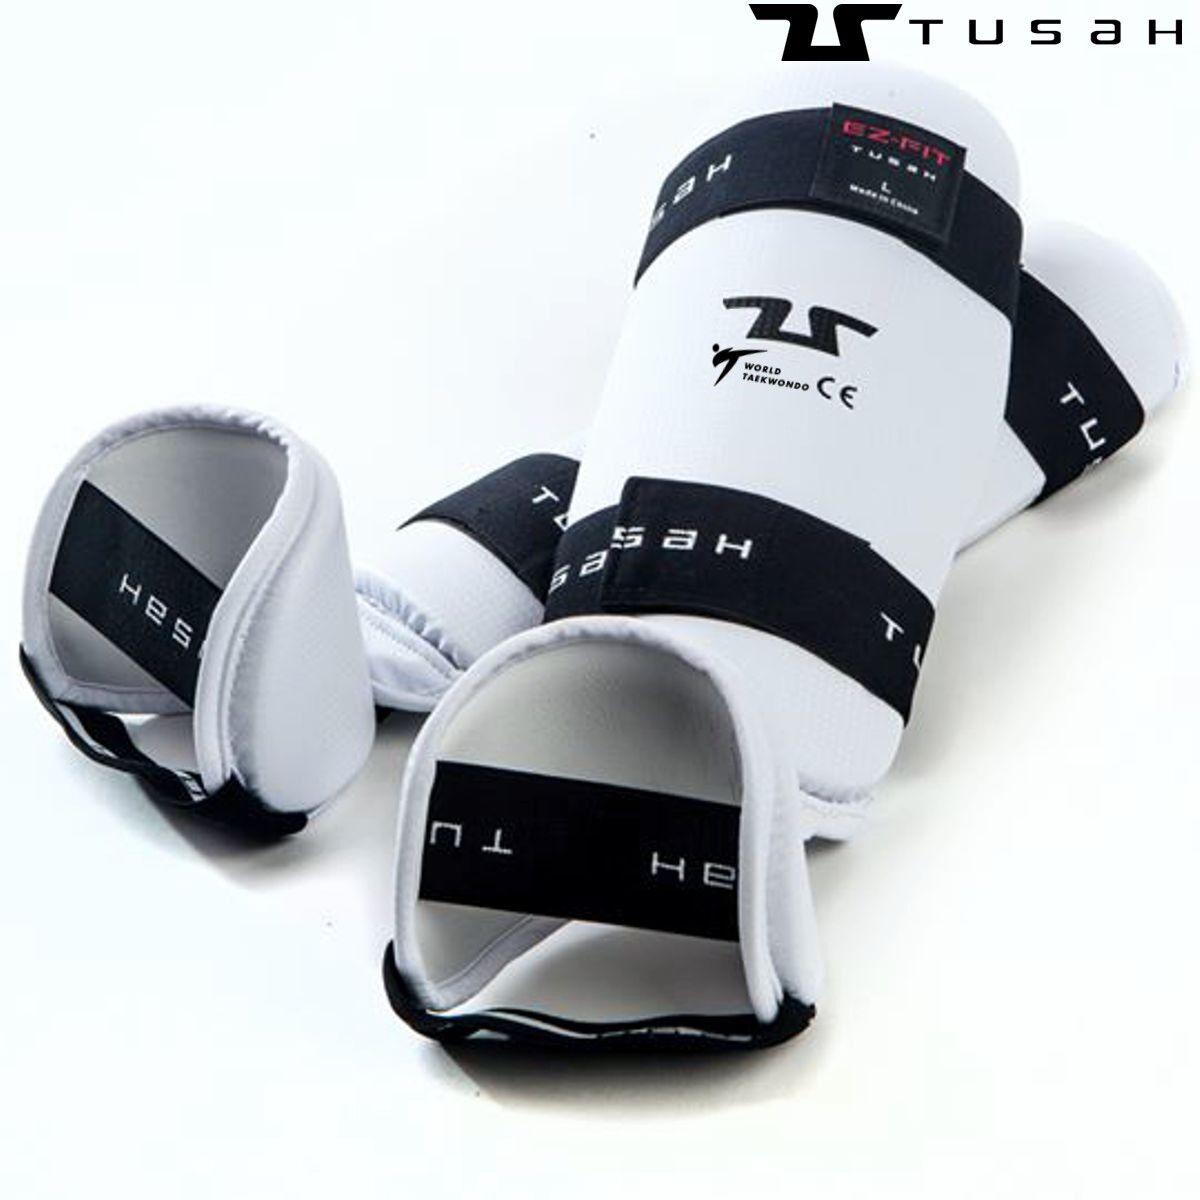 Tusah - Paratibia con Piede per Taekwondo Omologati WT